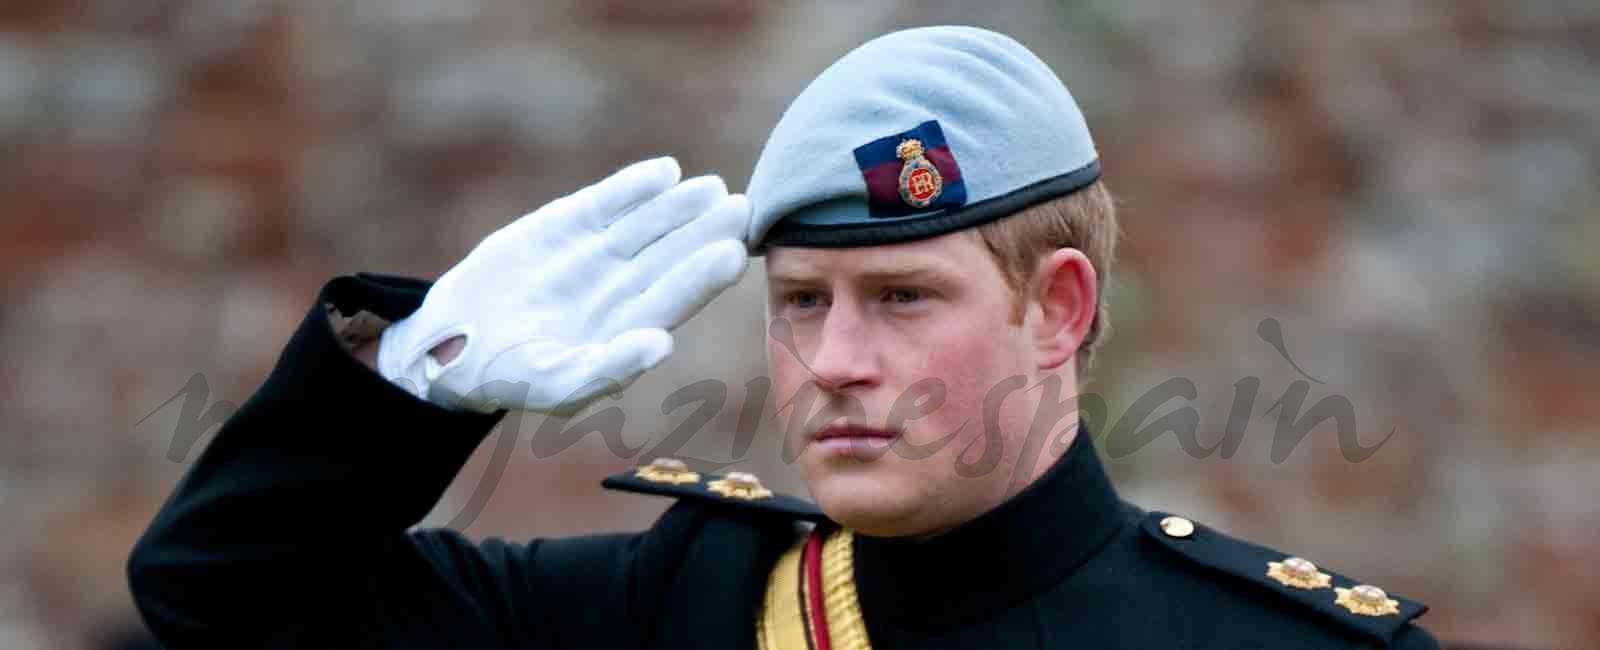 Así eran, Así son: Príncipe Harry de Inglaterra 2007-2017